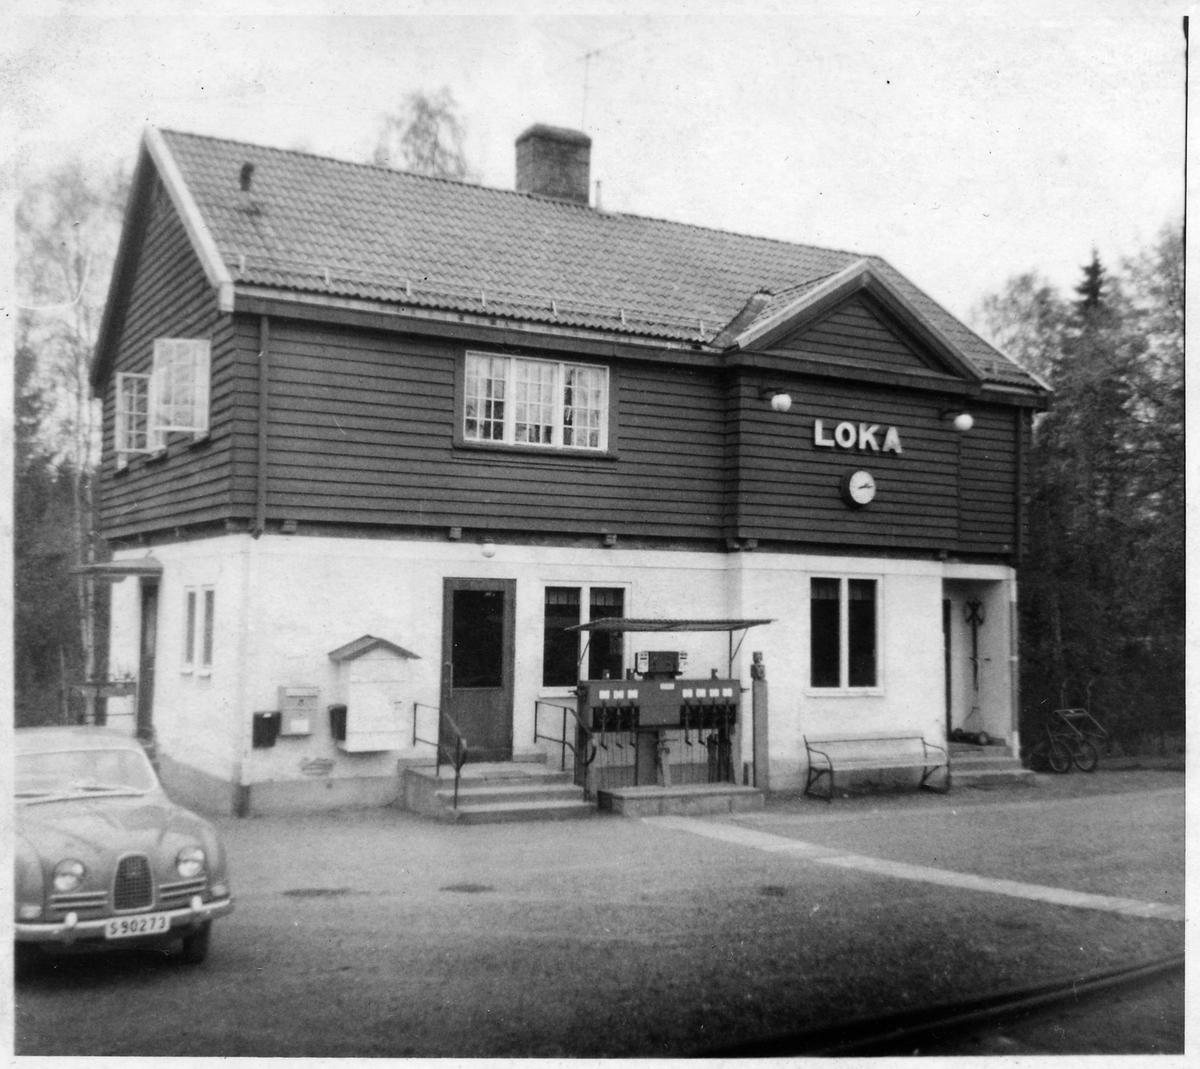 Loka station.